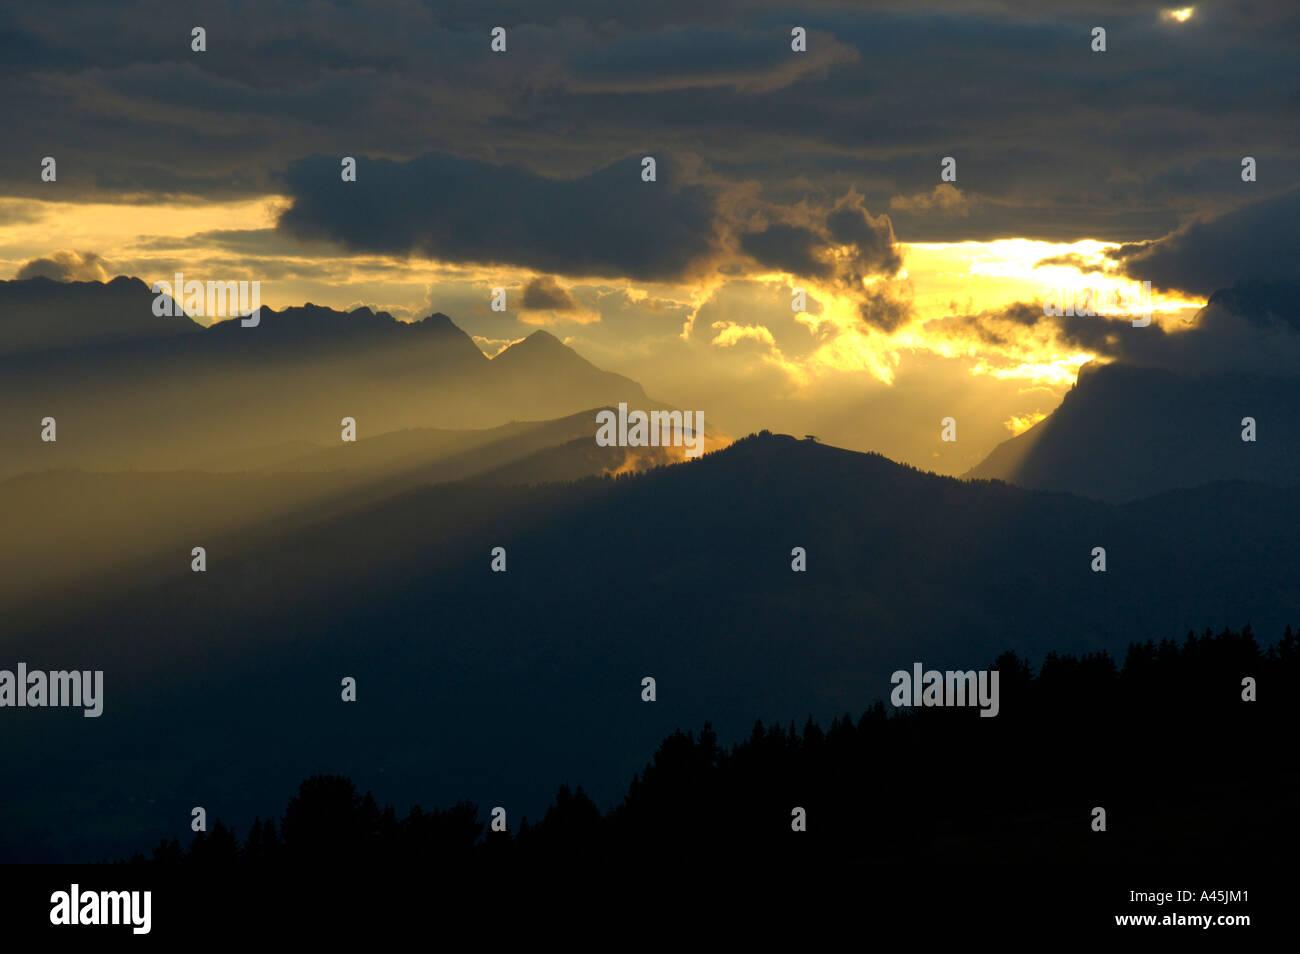 Evening sky yellow sunrays shine through dark skies Haute-Savoie France - Stock Image